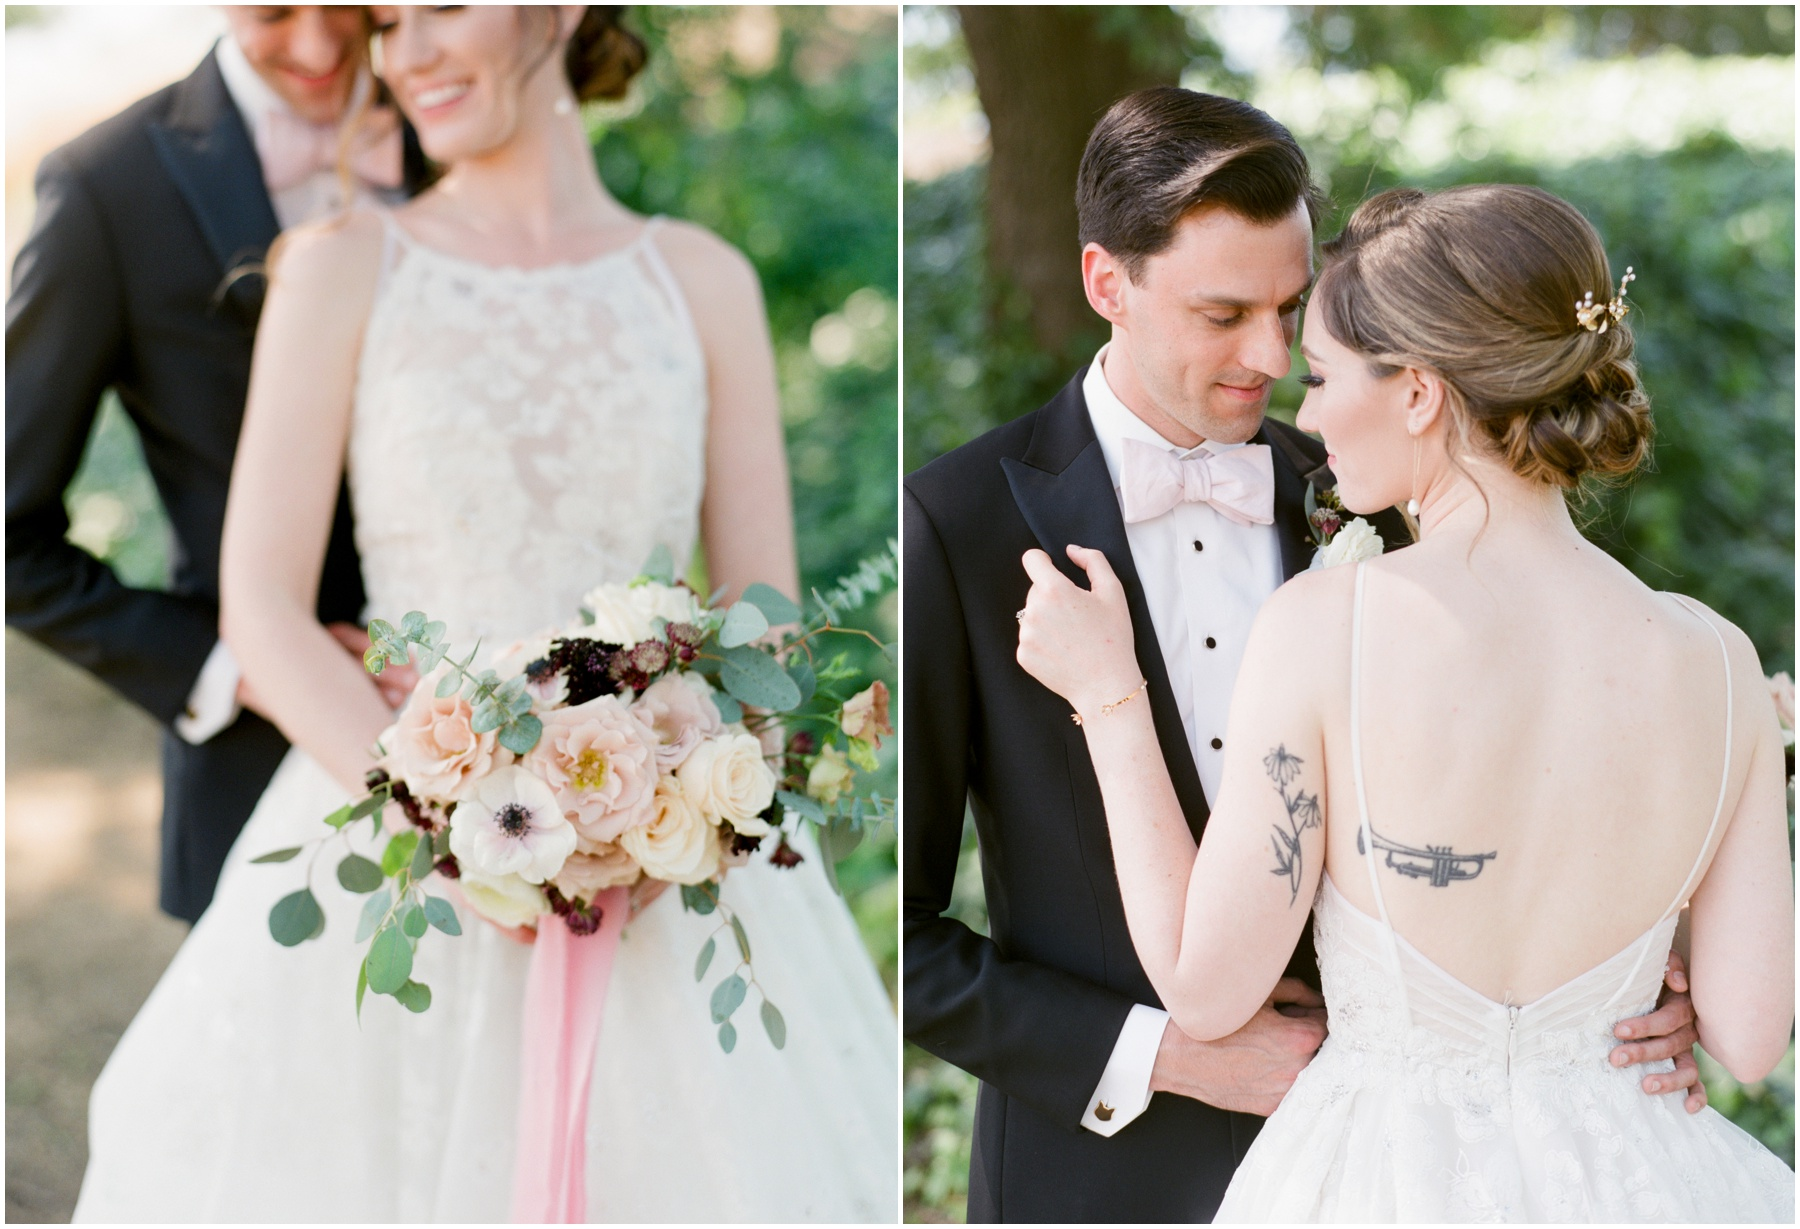 Scribner-bend-vineyards-wedding-sacramento-california-Kristine-Herman-Photography-12.jpg